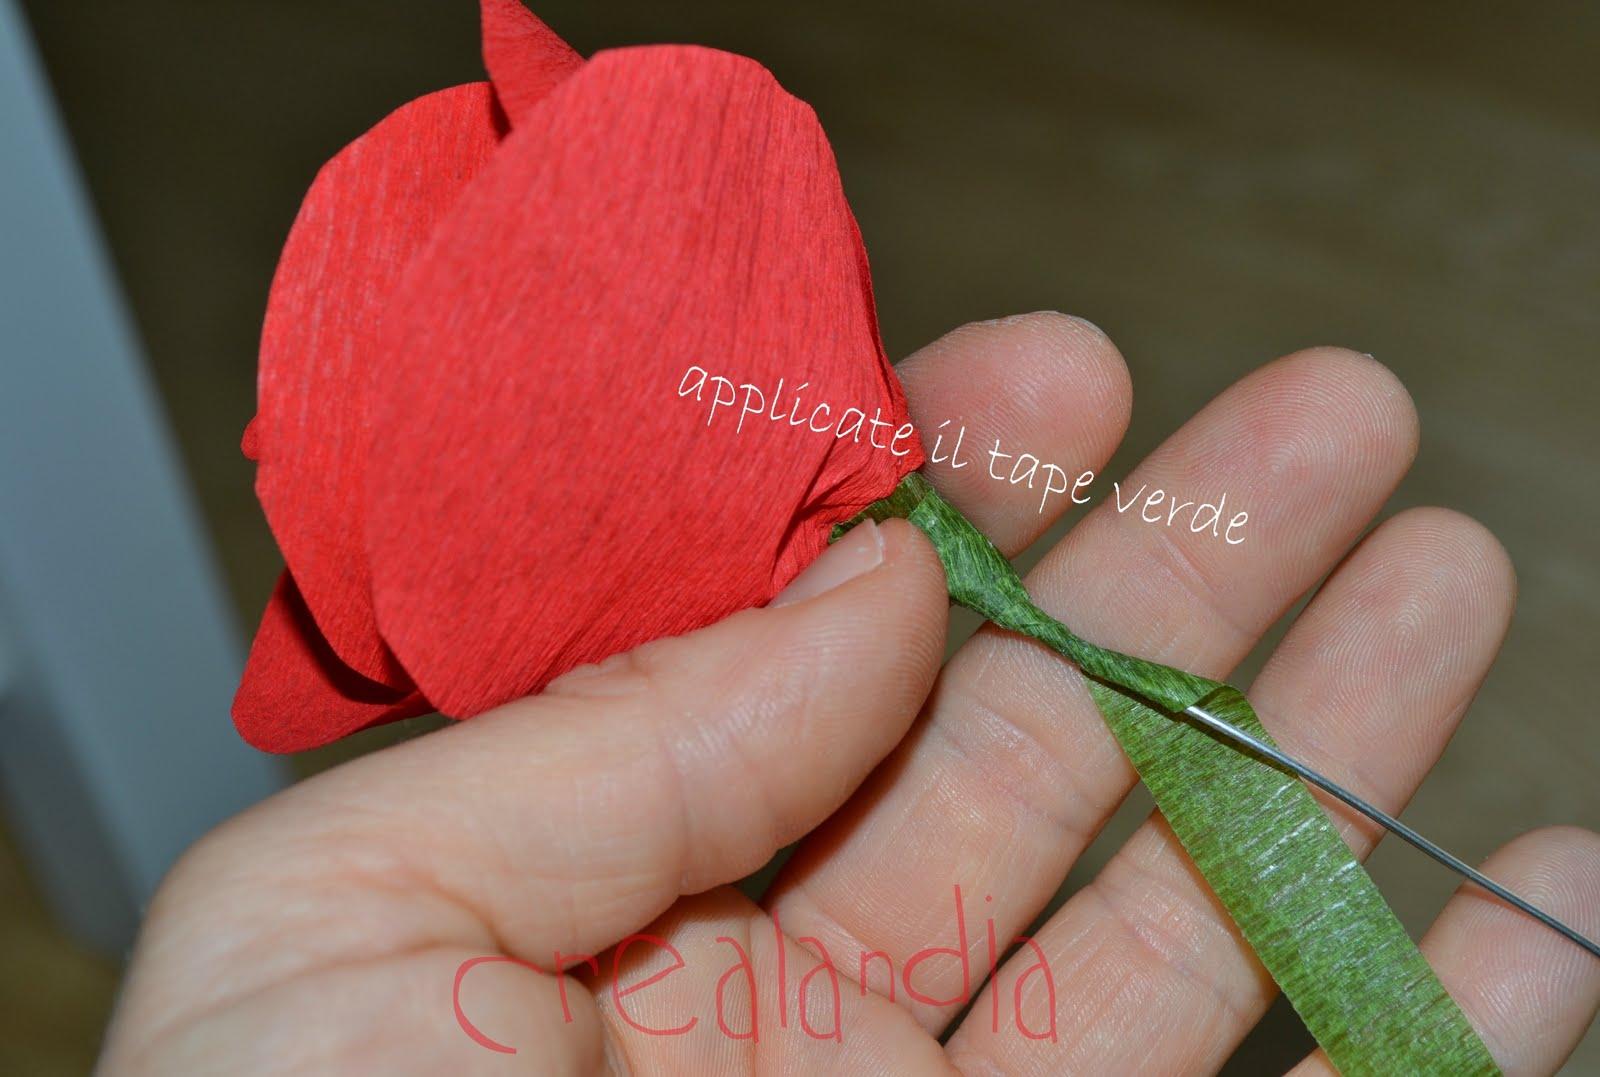 Papaveri Di Carta Crespa clarissad: papaveri di carta crespa